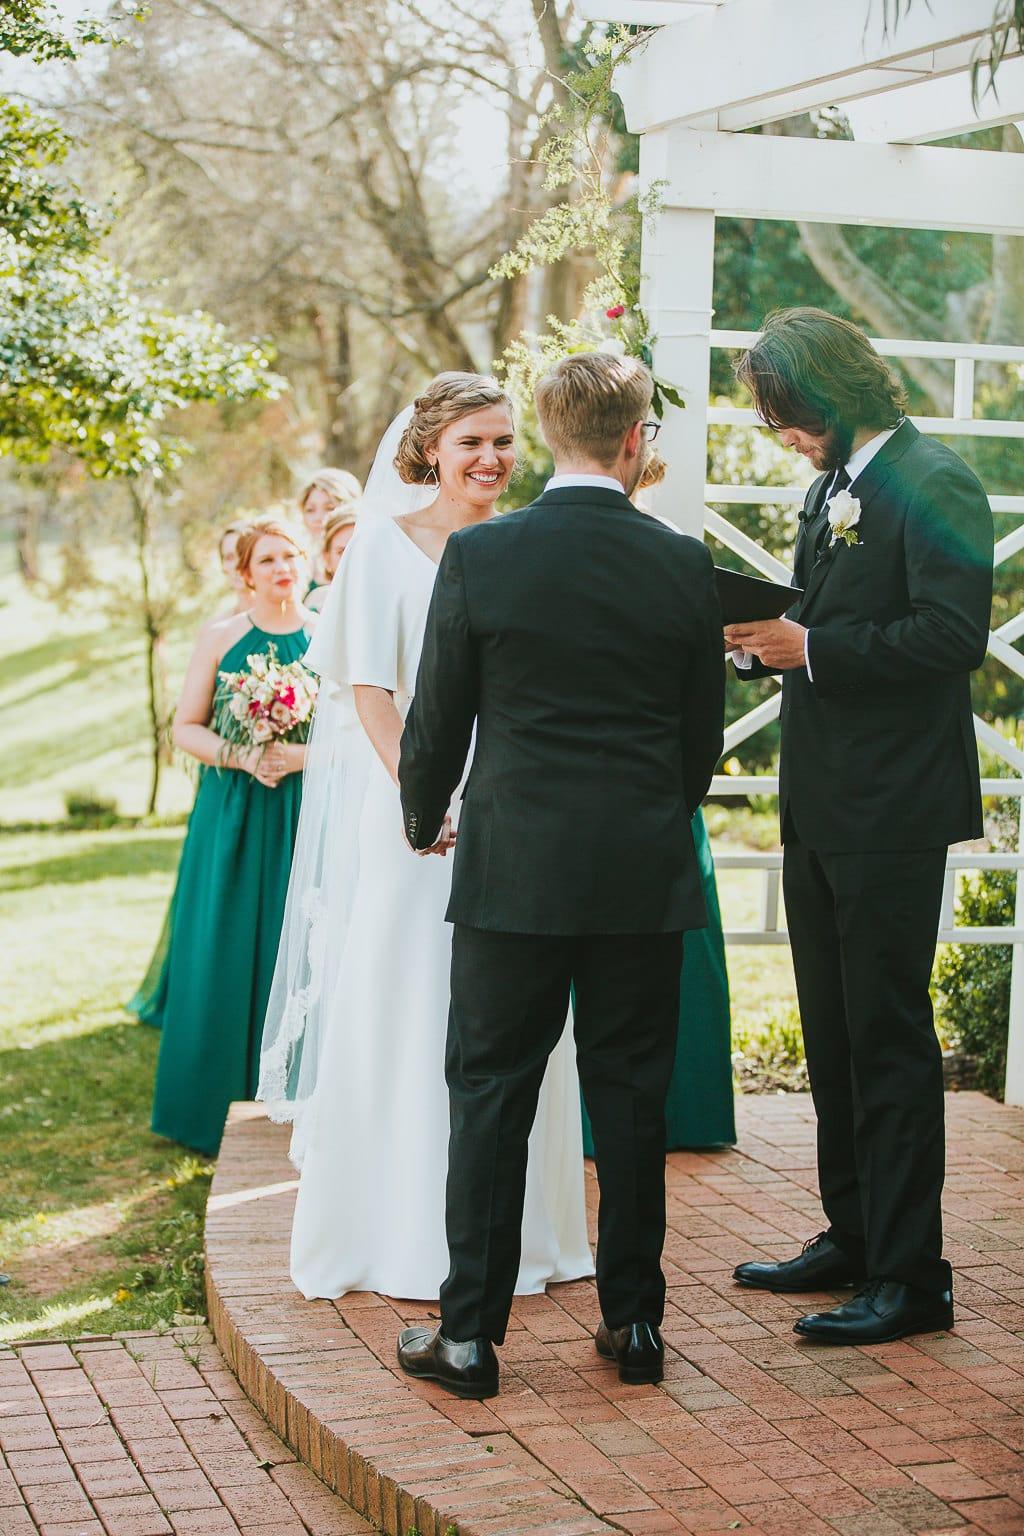 Also, our wedding cake is funfetti. BOOM.